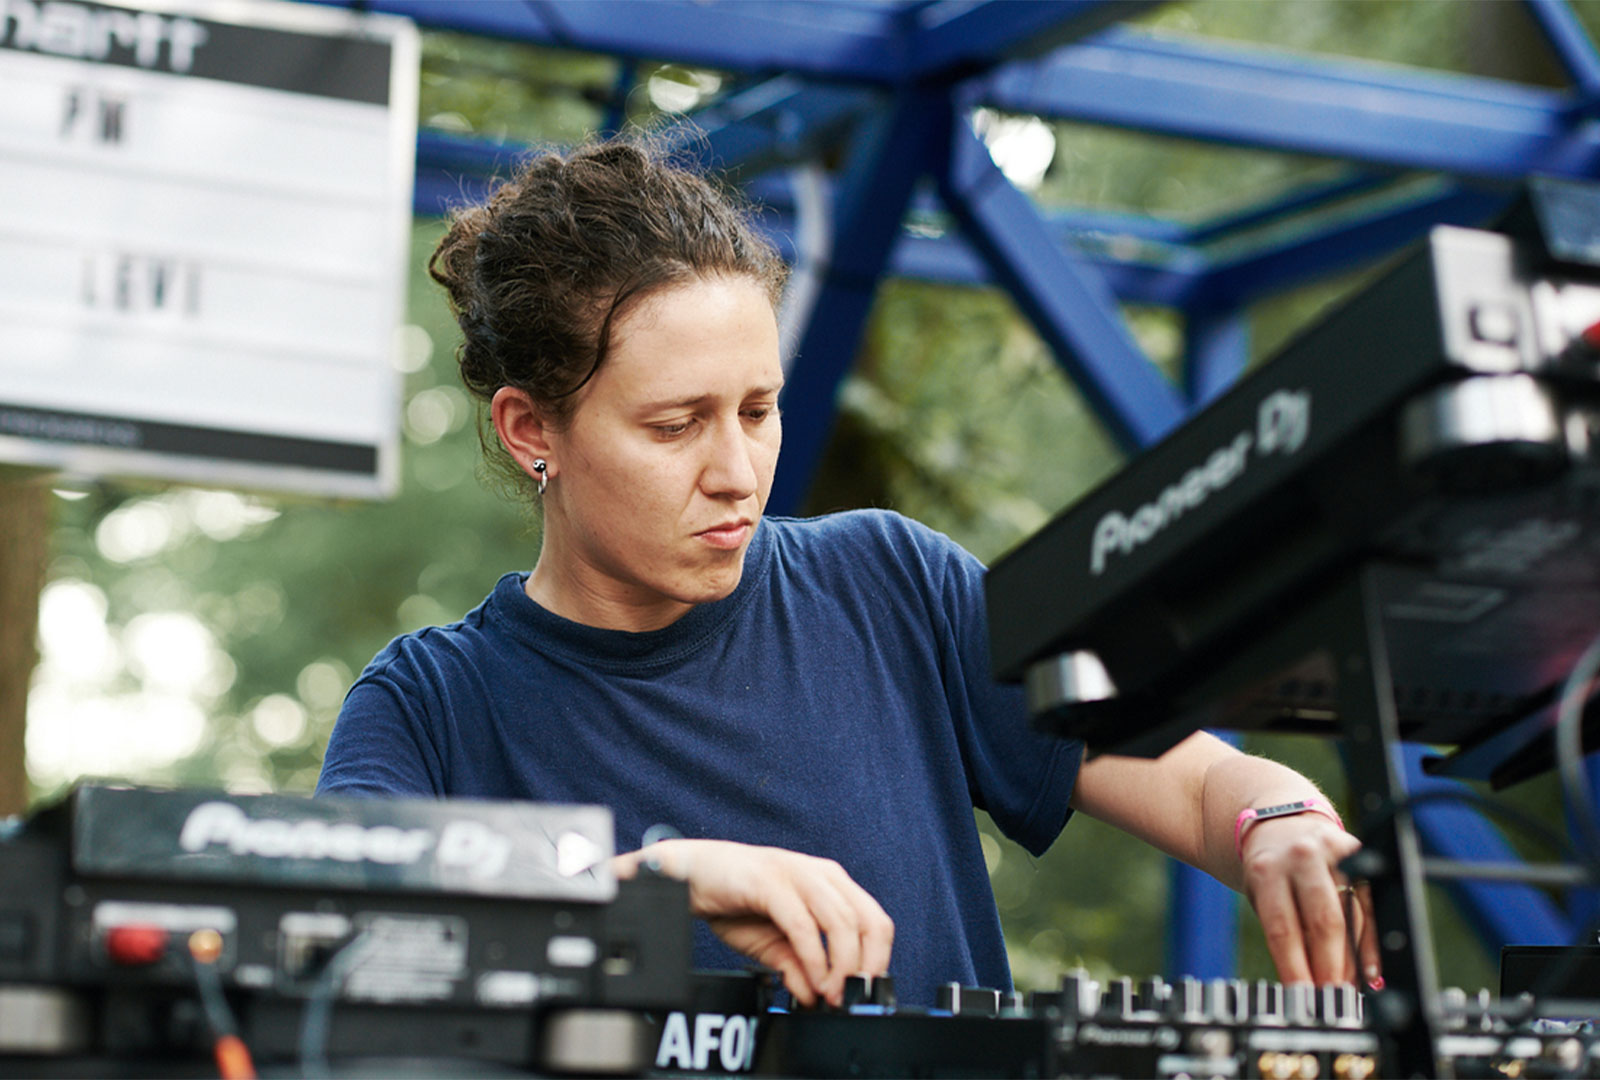 Mica Levi releasing Ruff Dog and Blue Alibi albums on vinyl